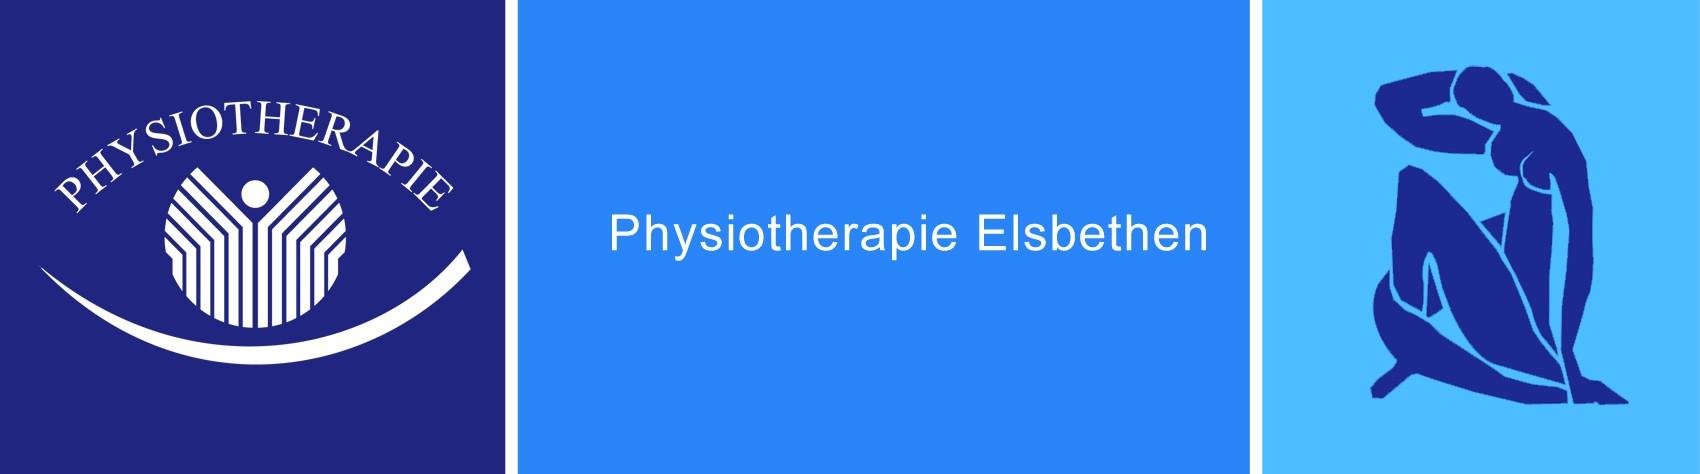 Physio Elsbethen